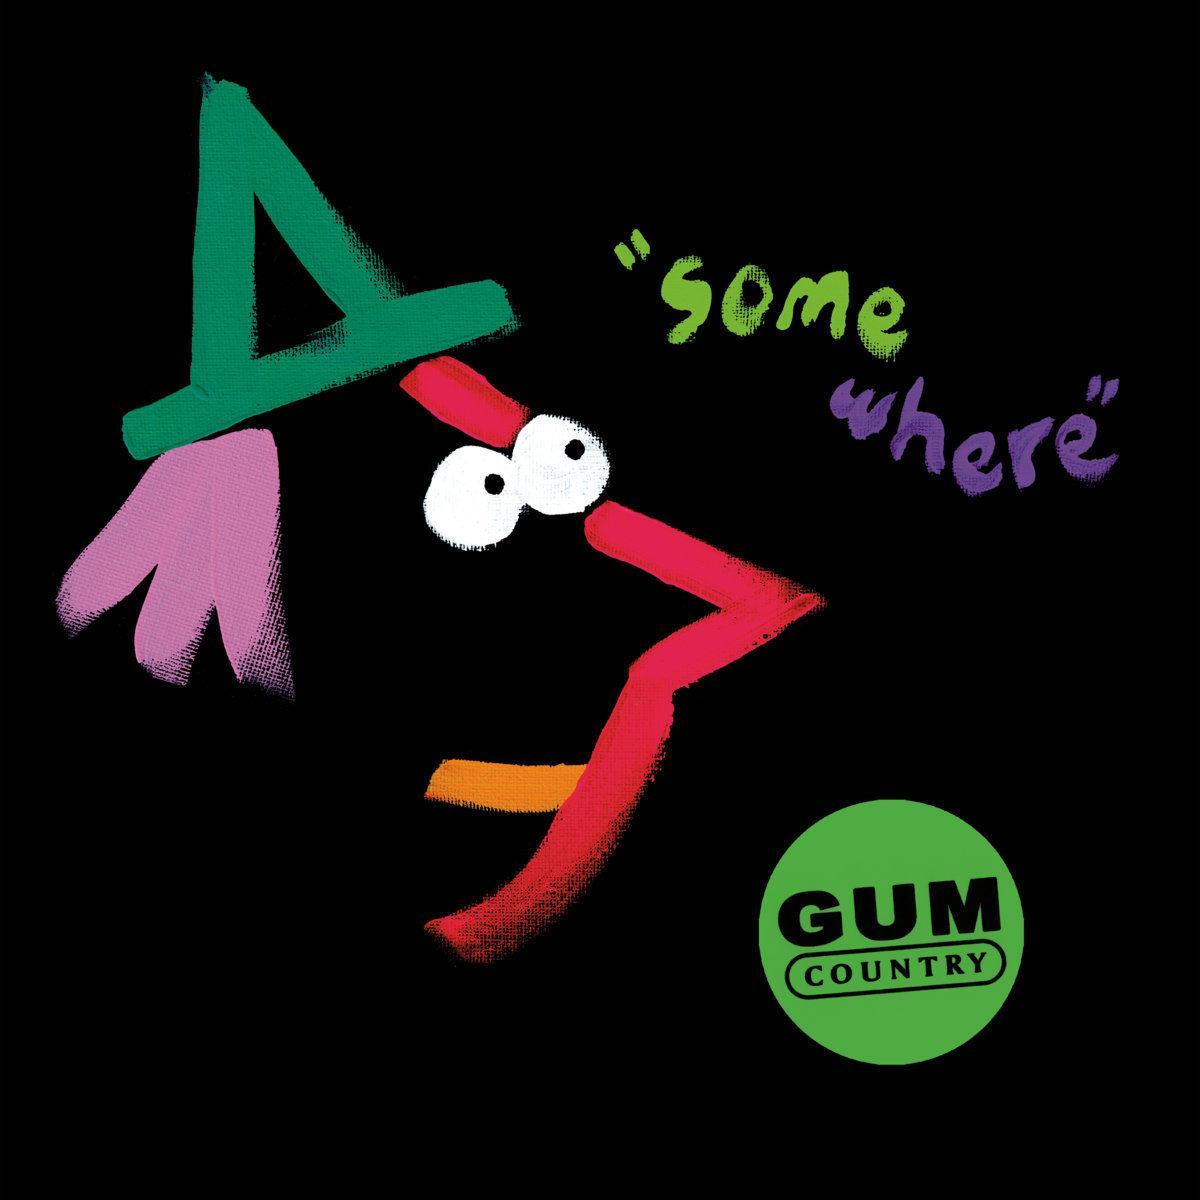 Gum Country (1).jpg